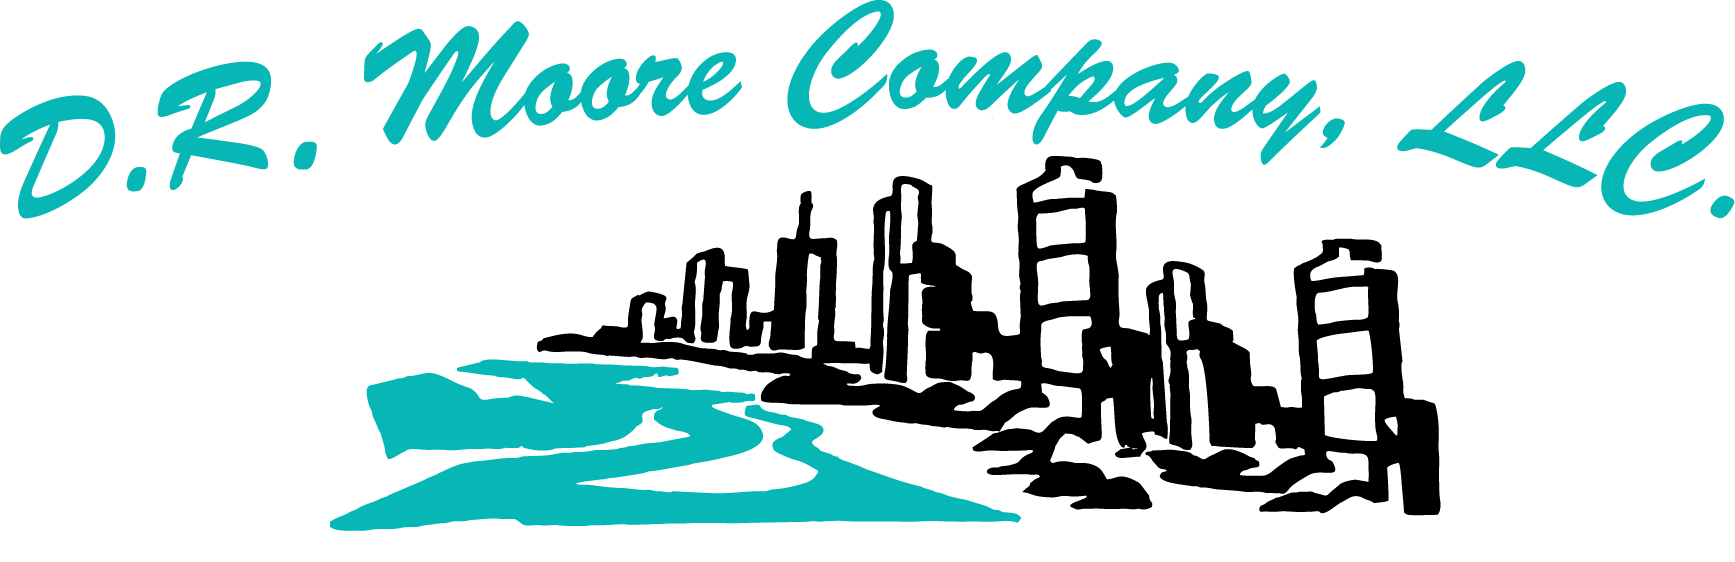 D.R. Moore Company, LLC